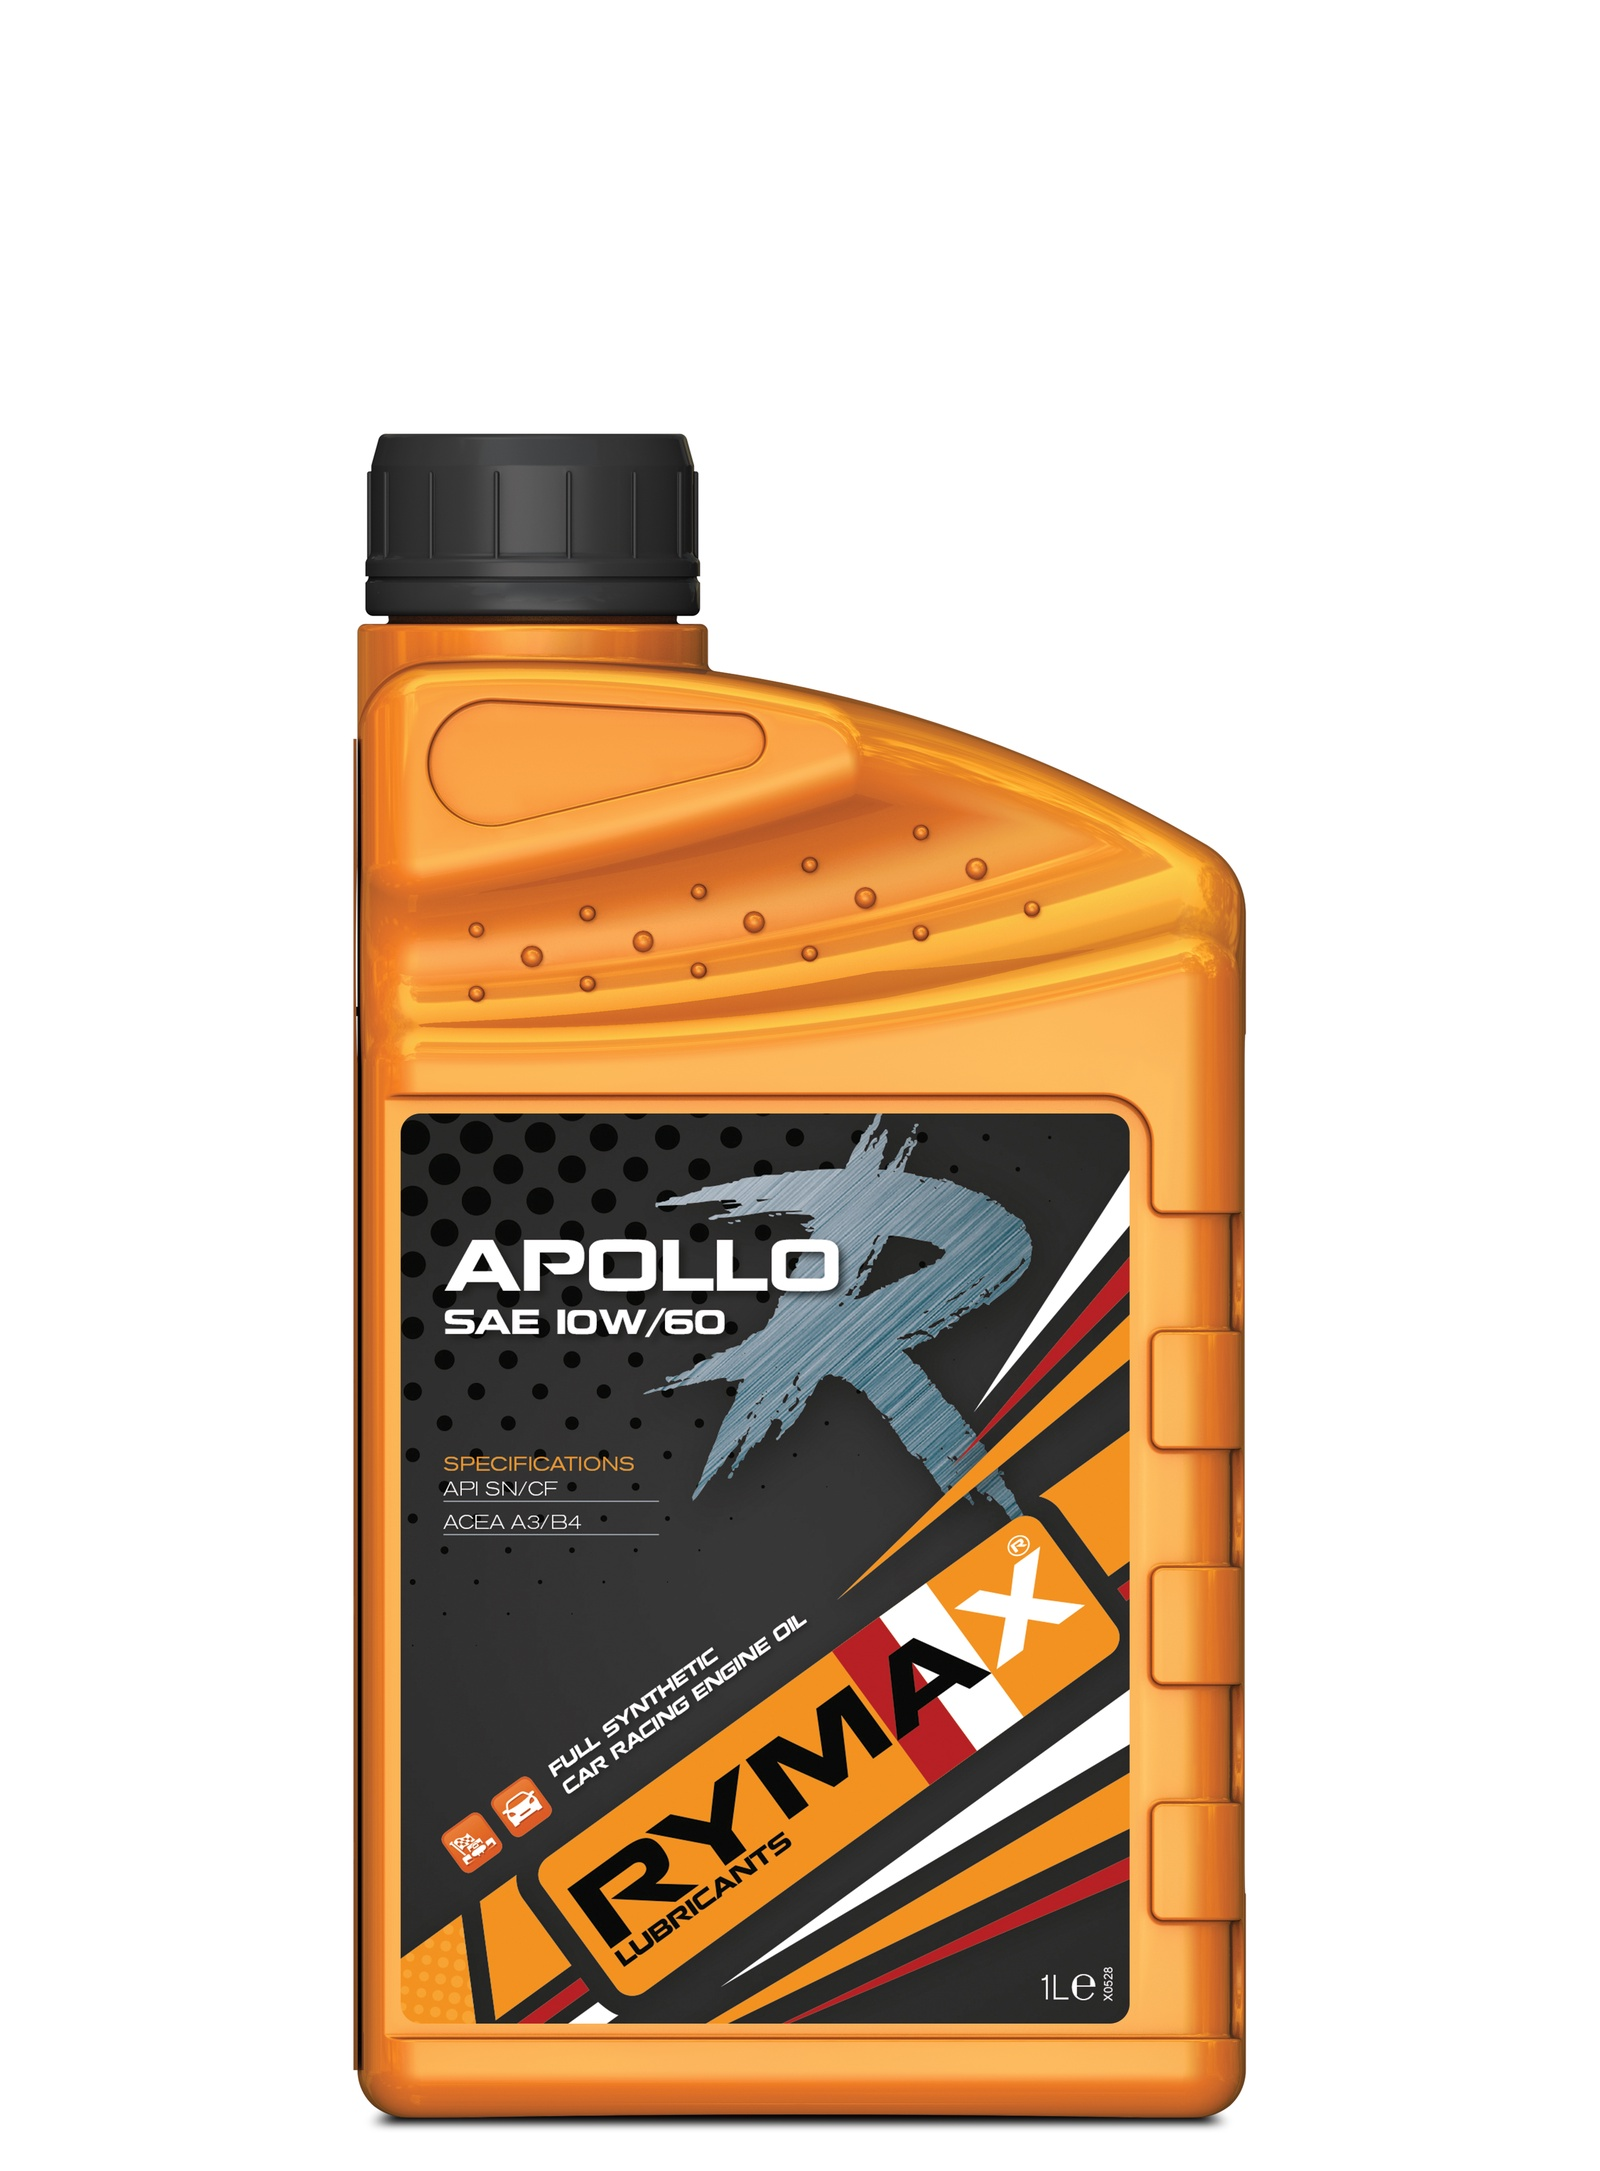 Моторное масло Rymax Apollo R SAE 10W-60, API SN/CF, ACEA A3/B4, спортивное на основе ПАО, 1 л